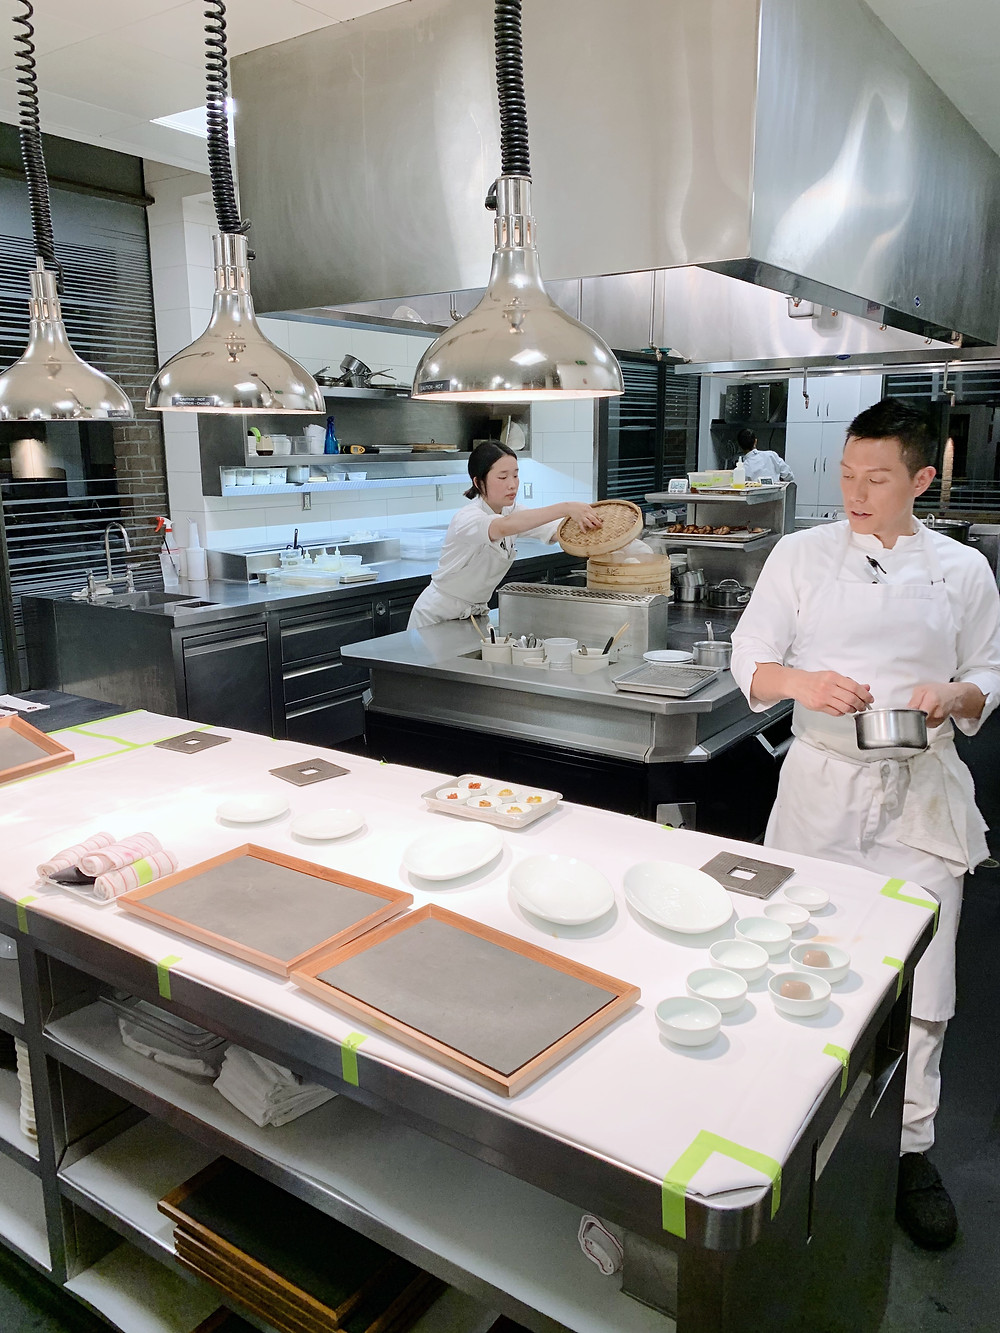 Kitchen at Benu Restaurant by Chef Corey Lee in San Francisco